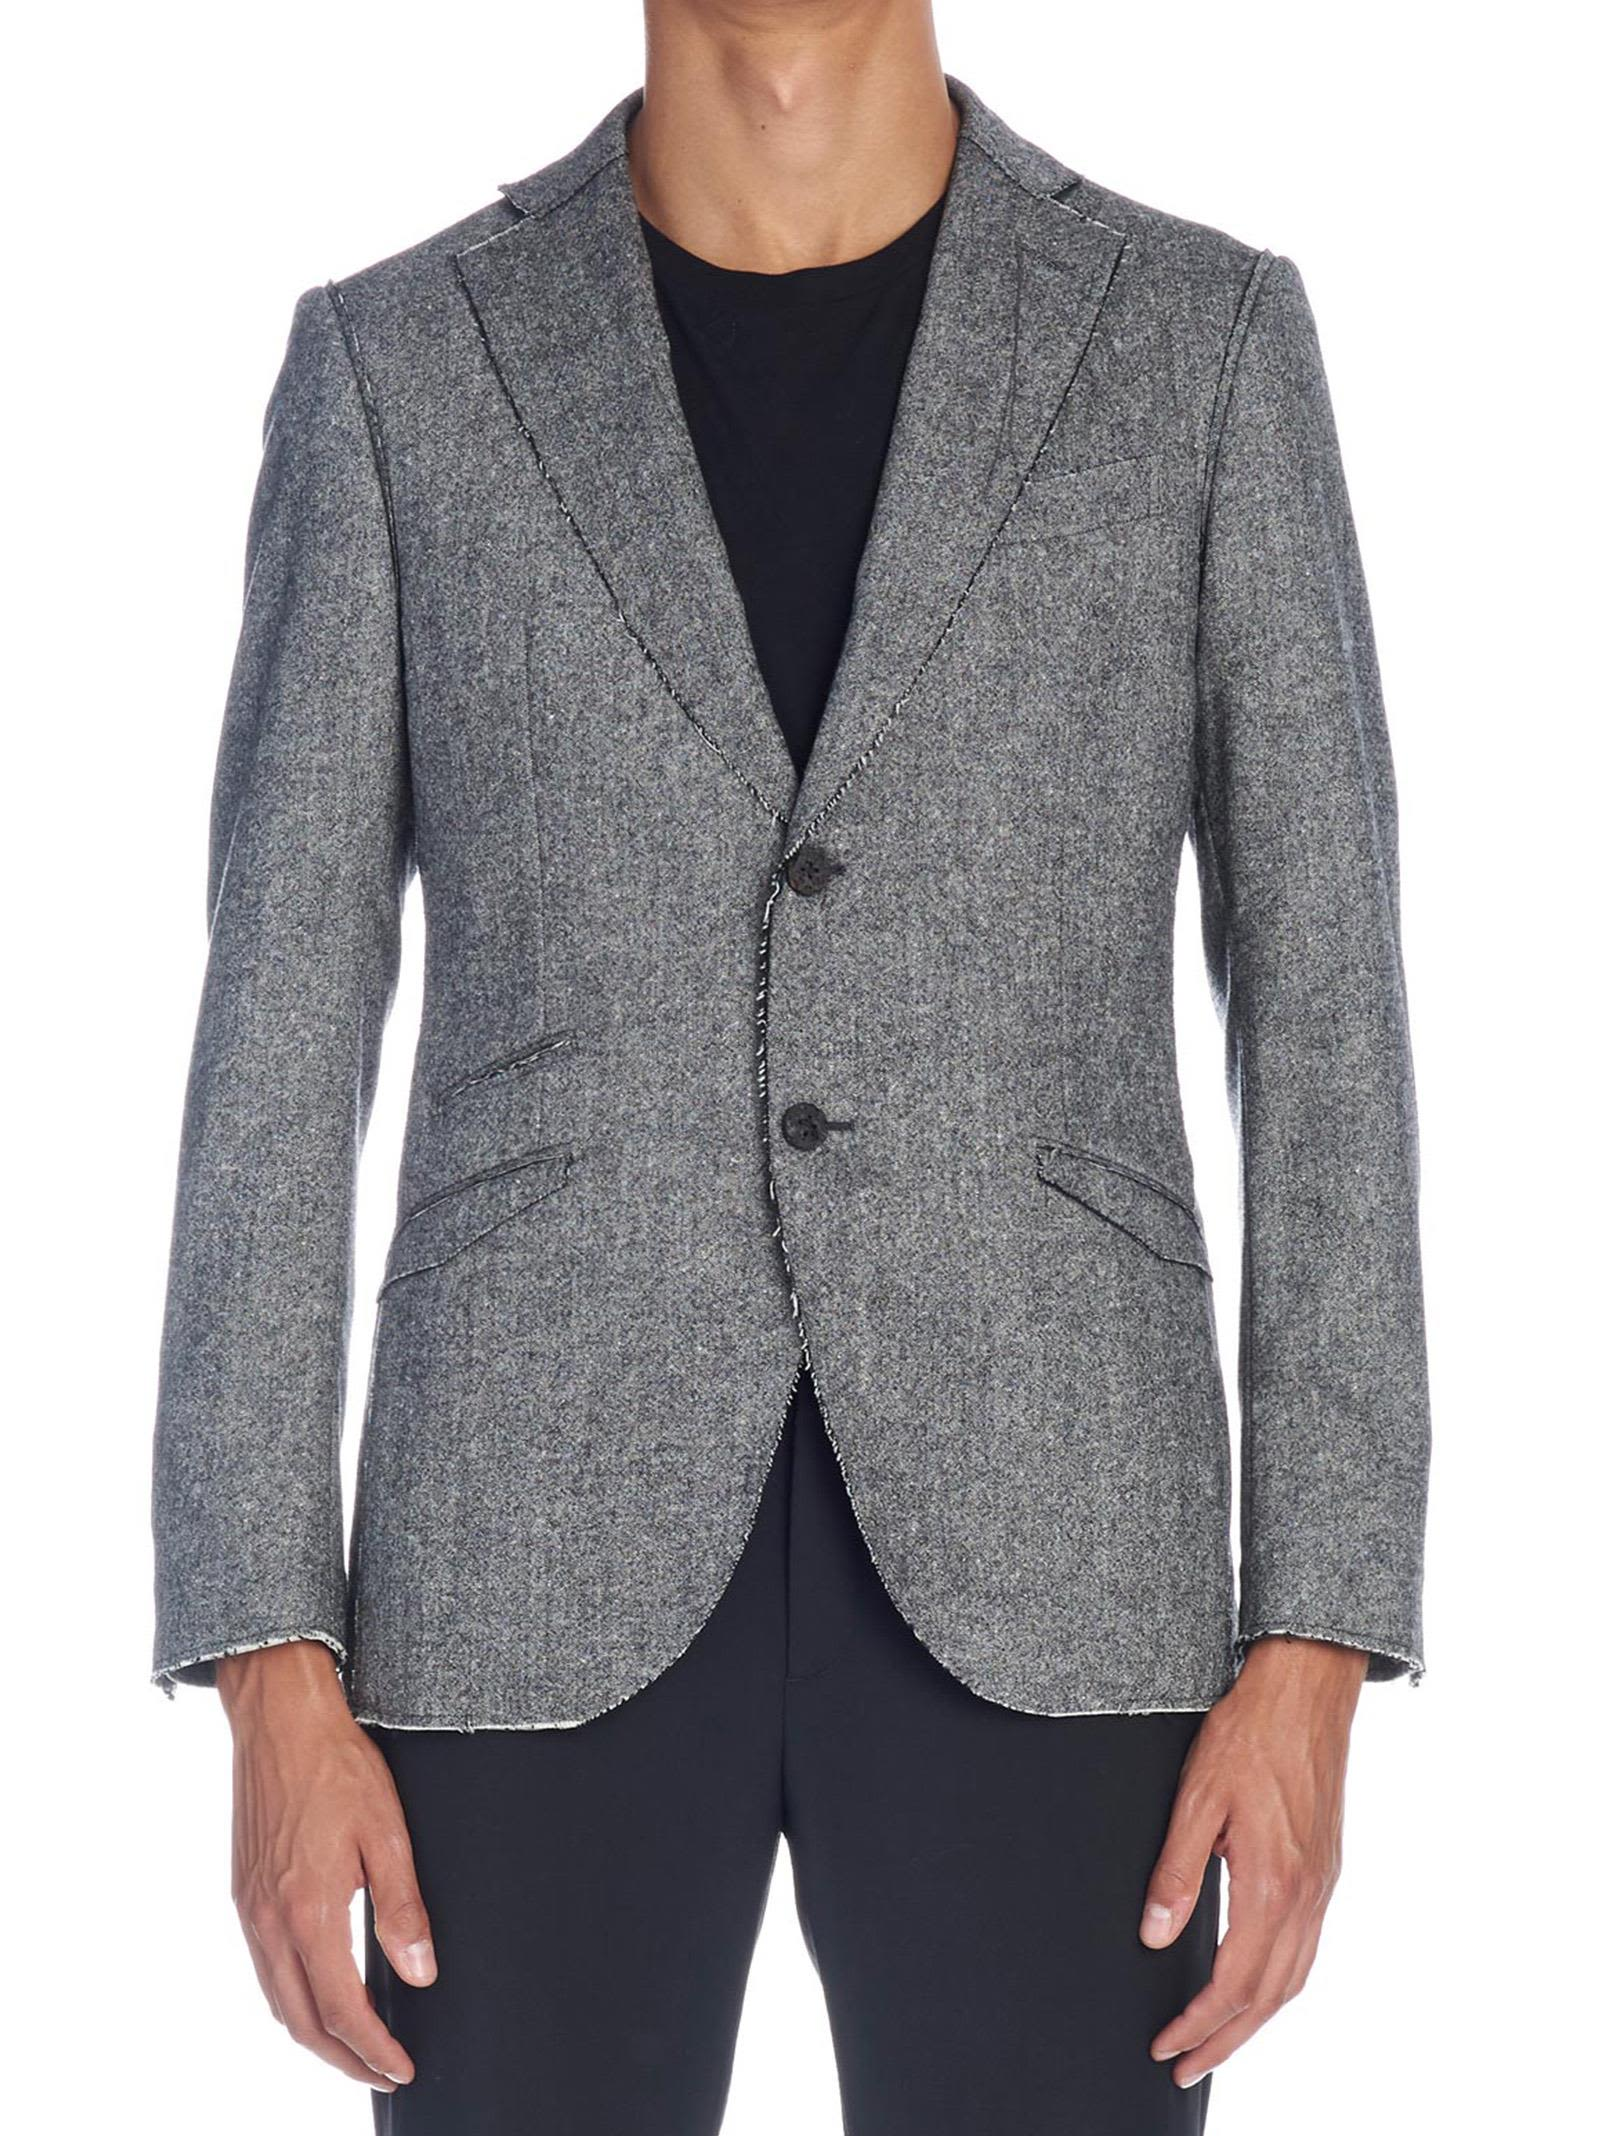 MAURIZIO MIRI 'Vincent' Jacket in Grey